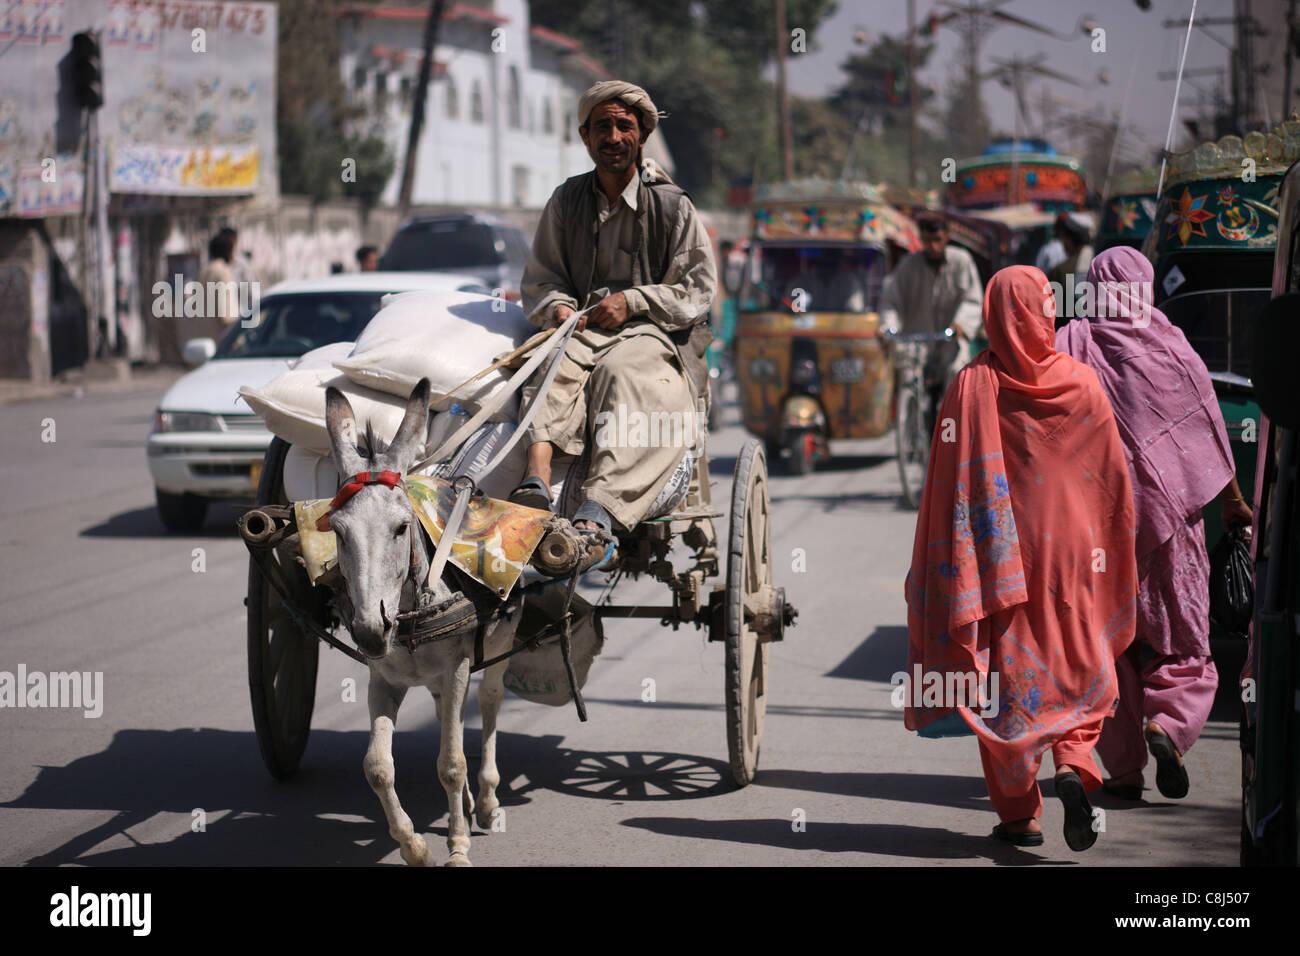 Quetta Pakistan Stock Photos & Quetta Pakistan Stock Images